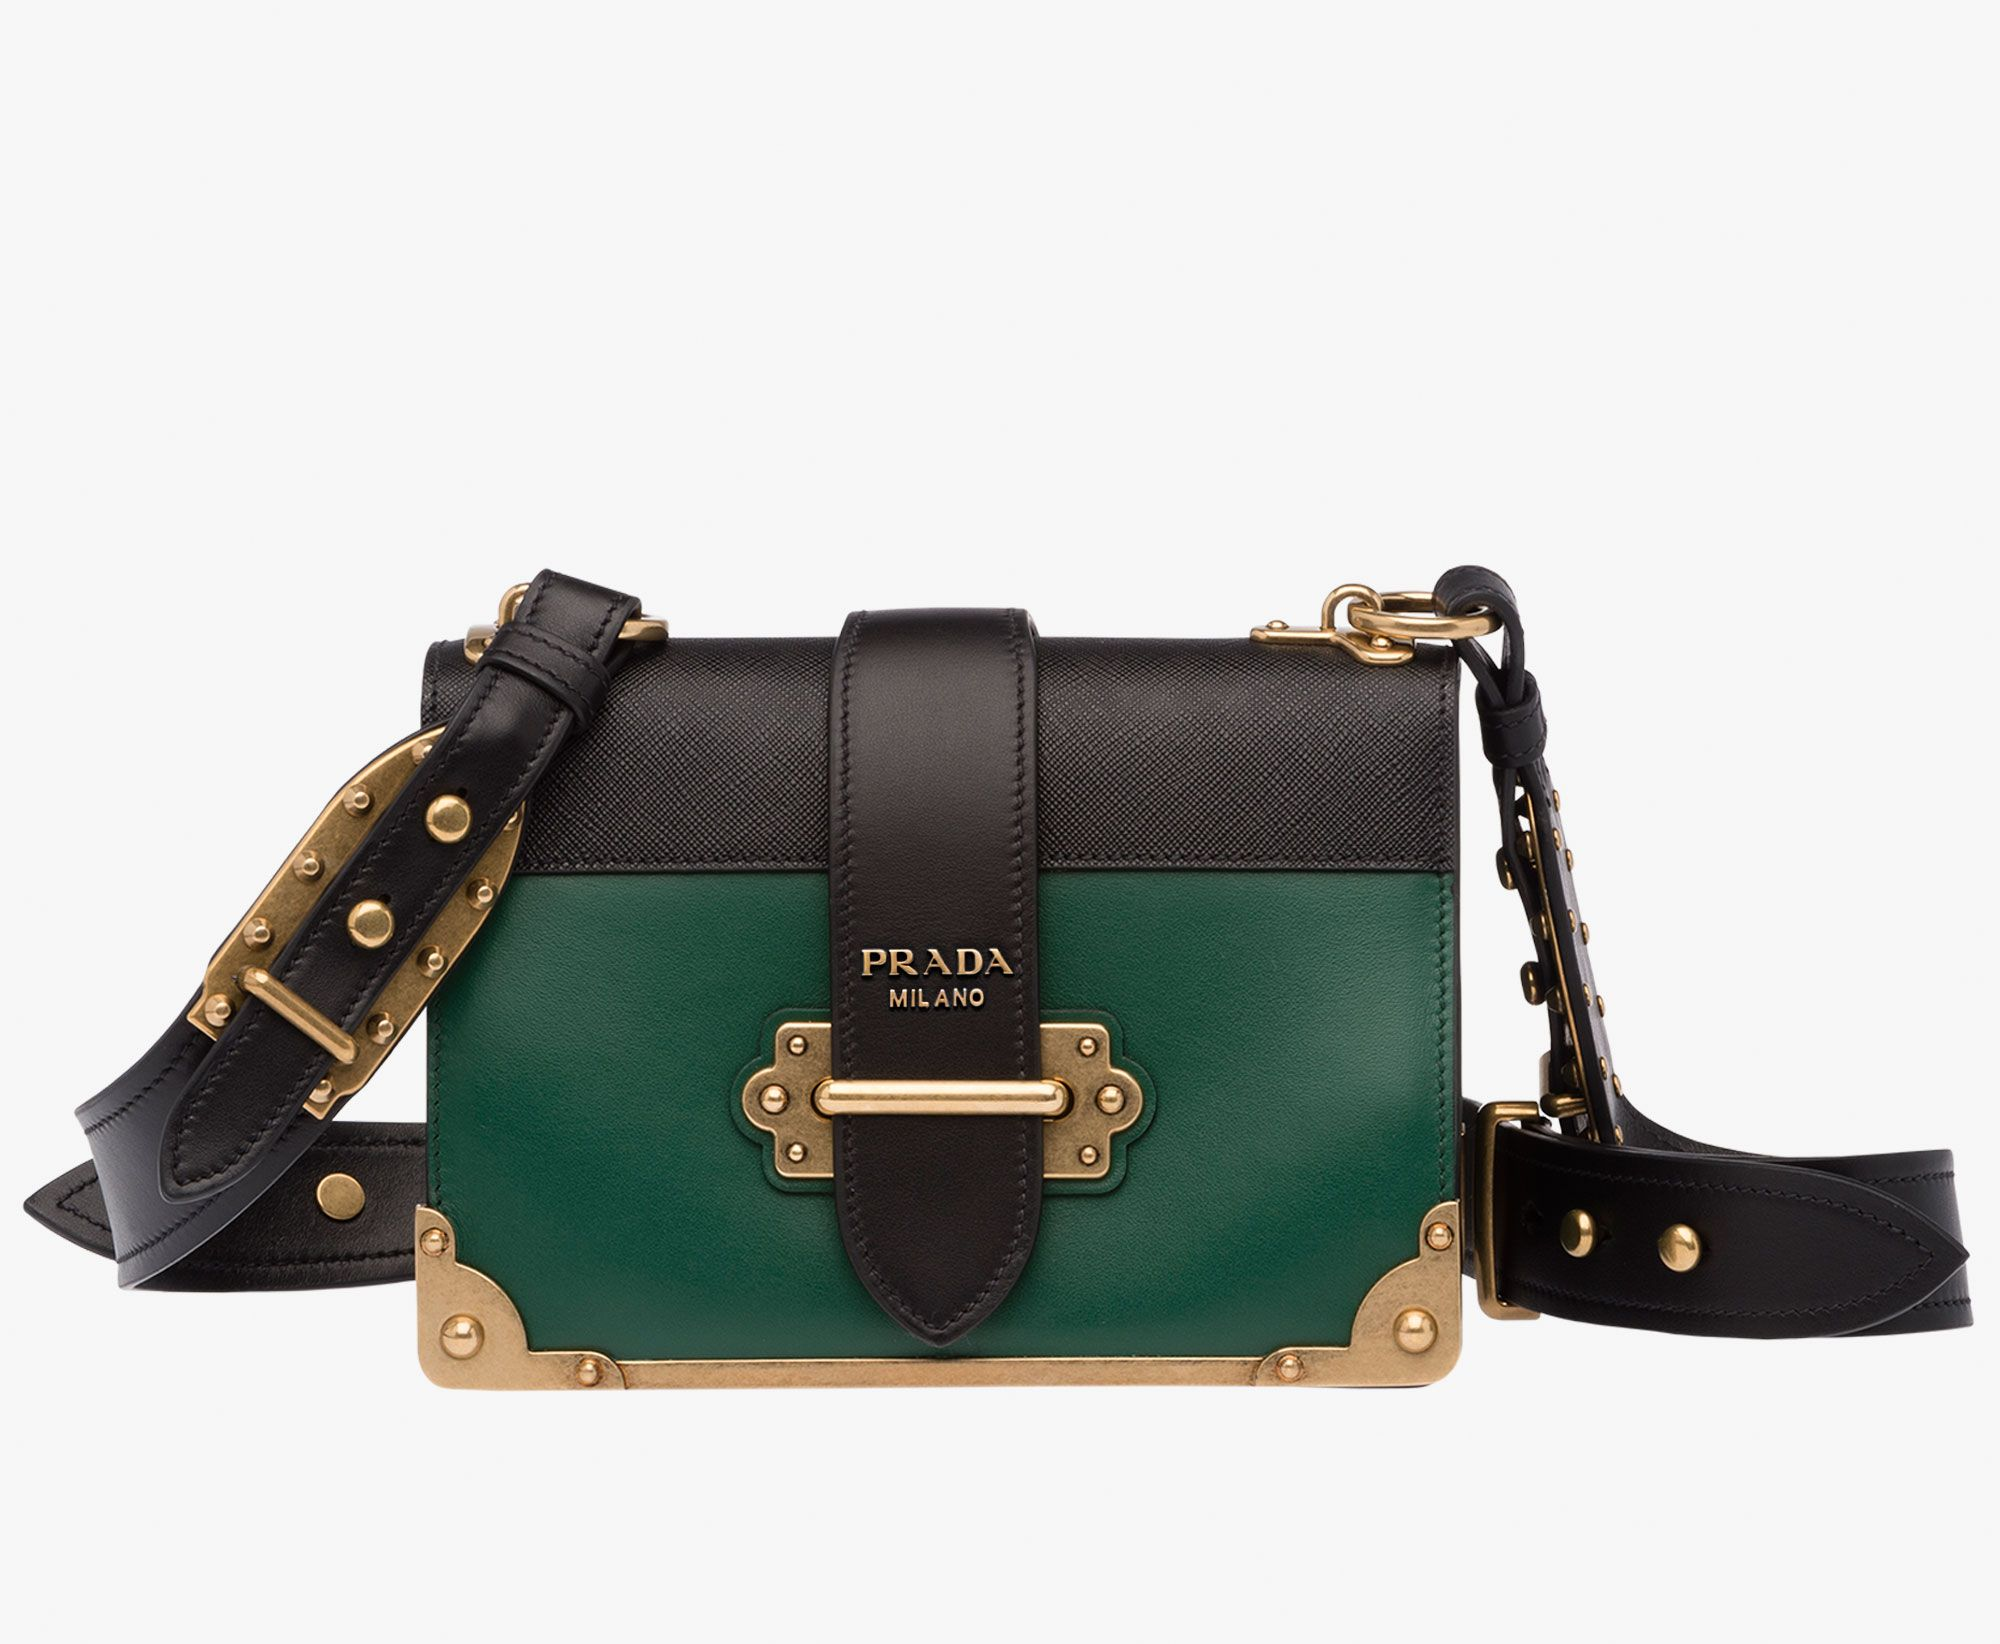 Embellished Cahier Bag - Only One Size / Multi Prada Buy Cheap Big Discount rNNSBl